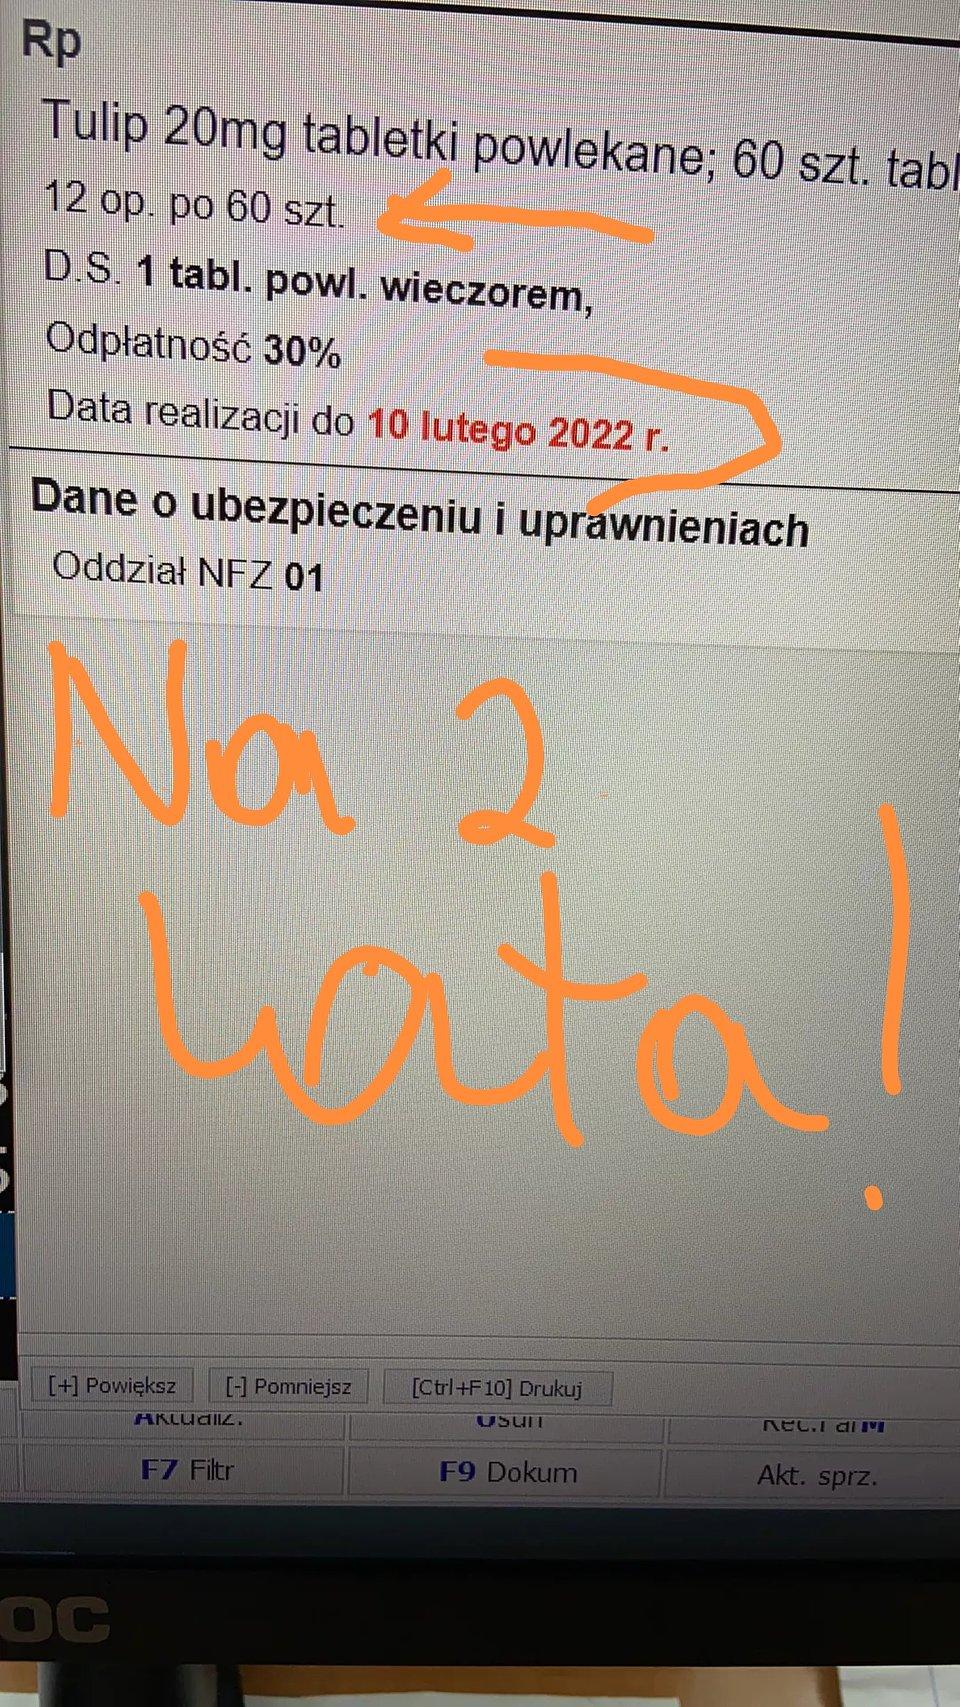 IMG_20210210_131540.jpg